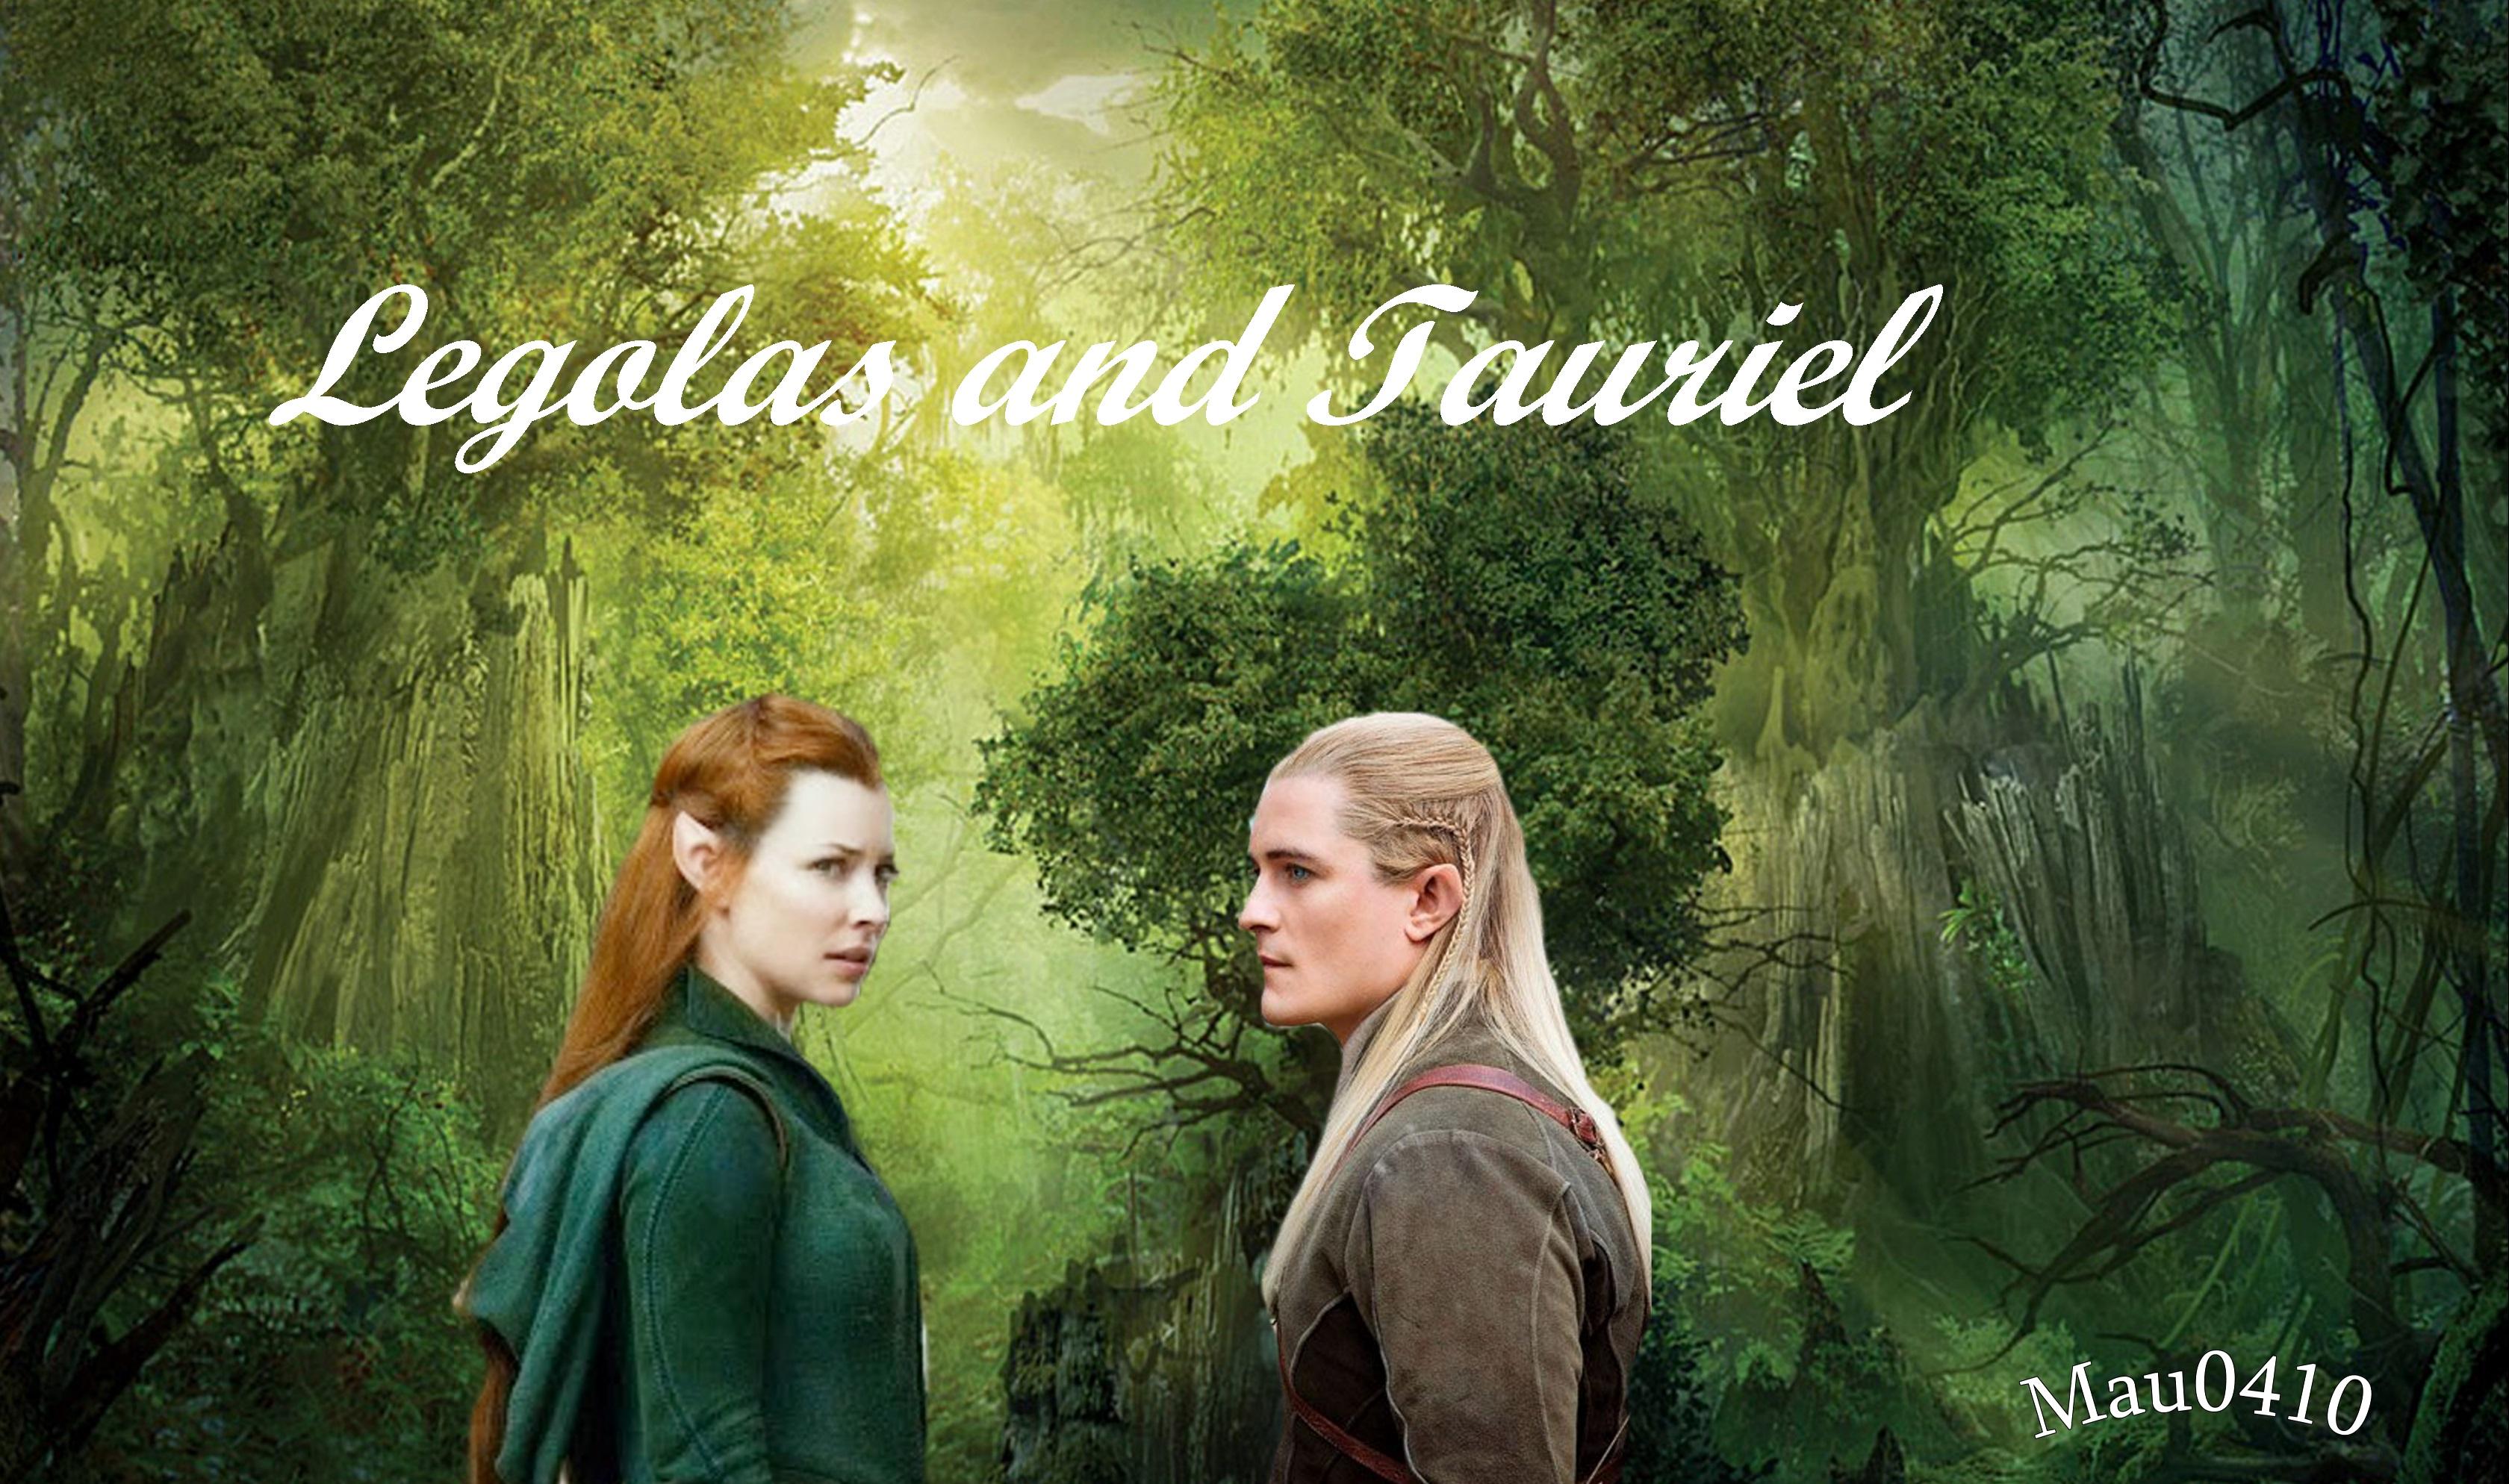 Legolas and Tauriel images Legolas and Tauriel HD wallpaper and